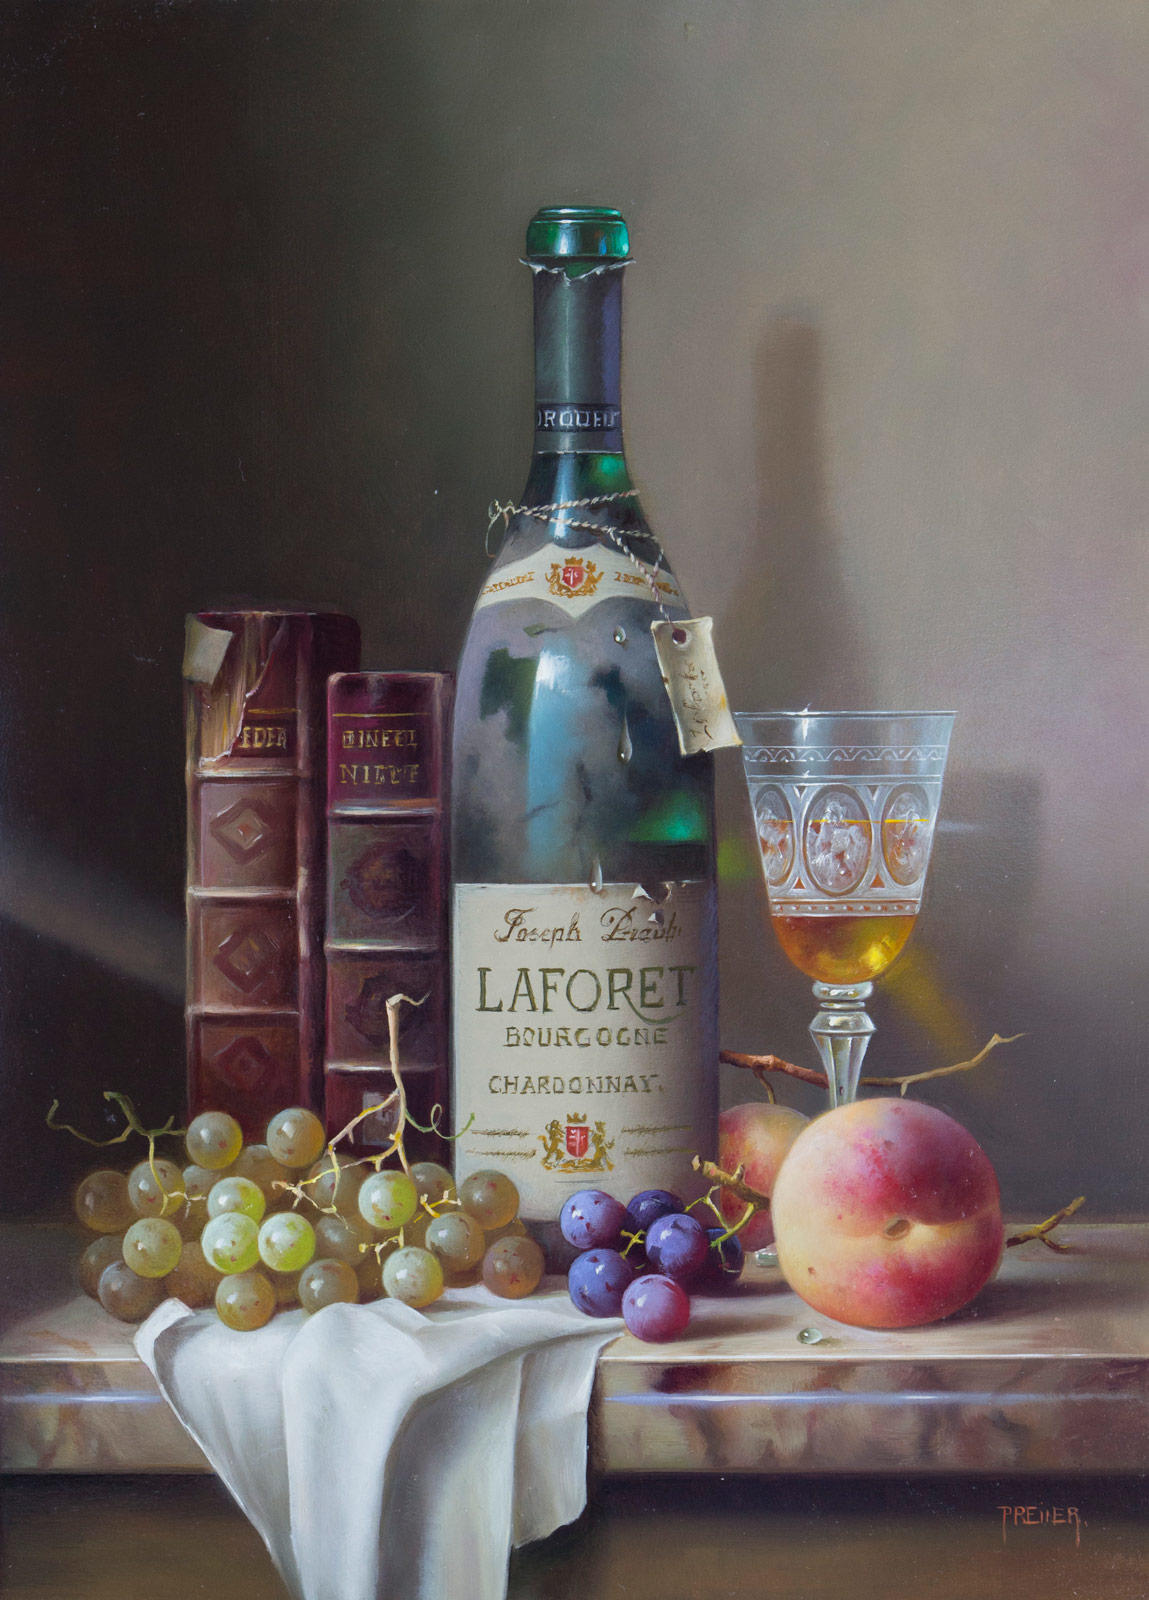 La Foret Chardonnay